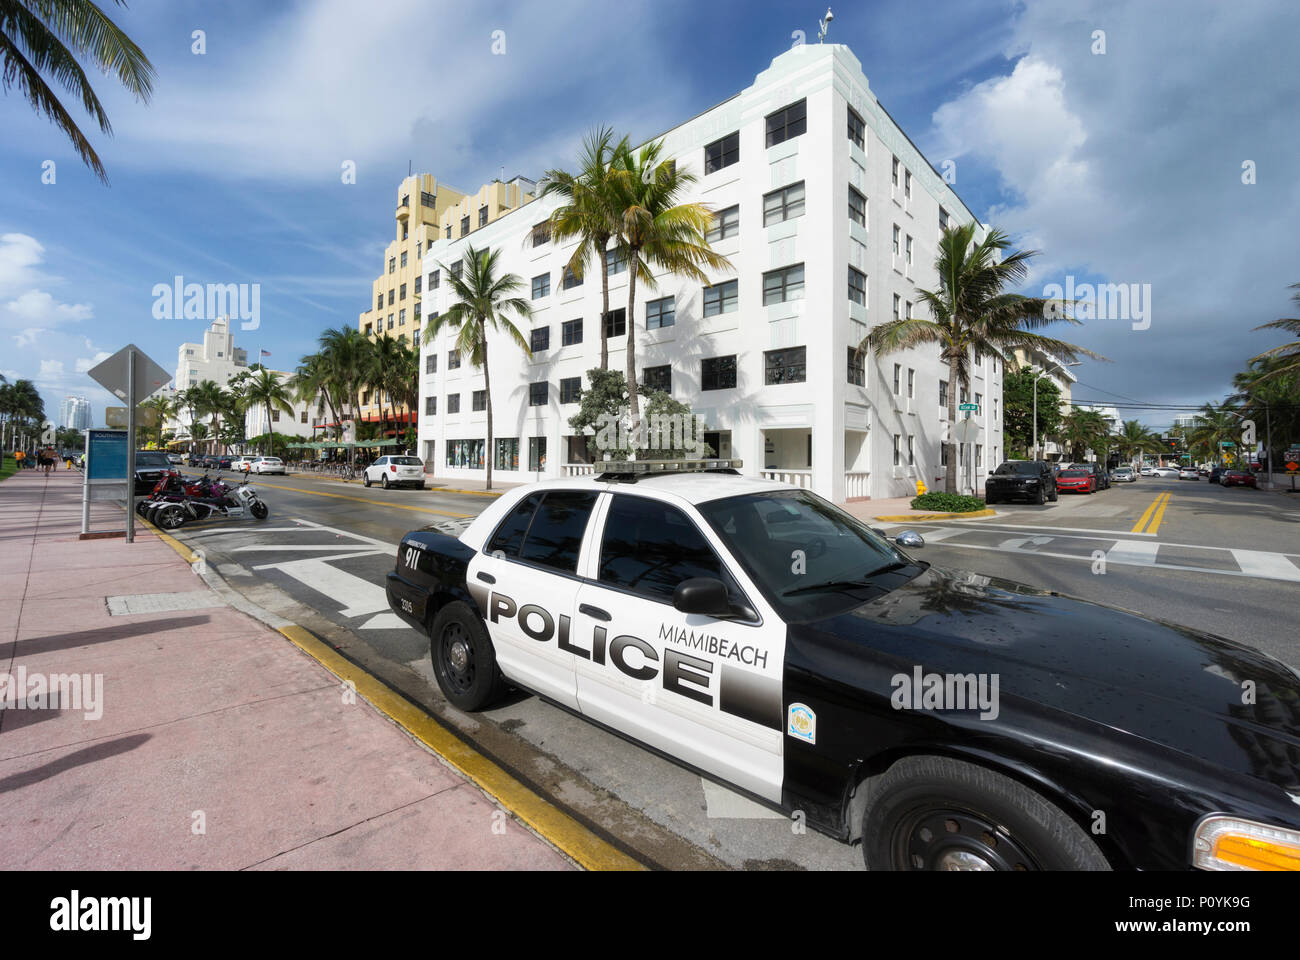 MIAMI BEACH, FLORIDA - JUNE 9, 2018: the famous art deco district of Ocean Drive in South Beach Miami, USA - Stock Image